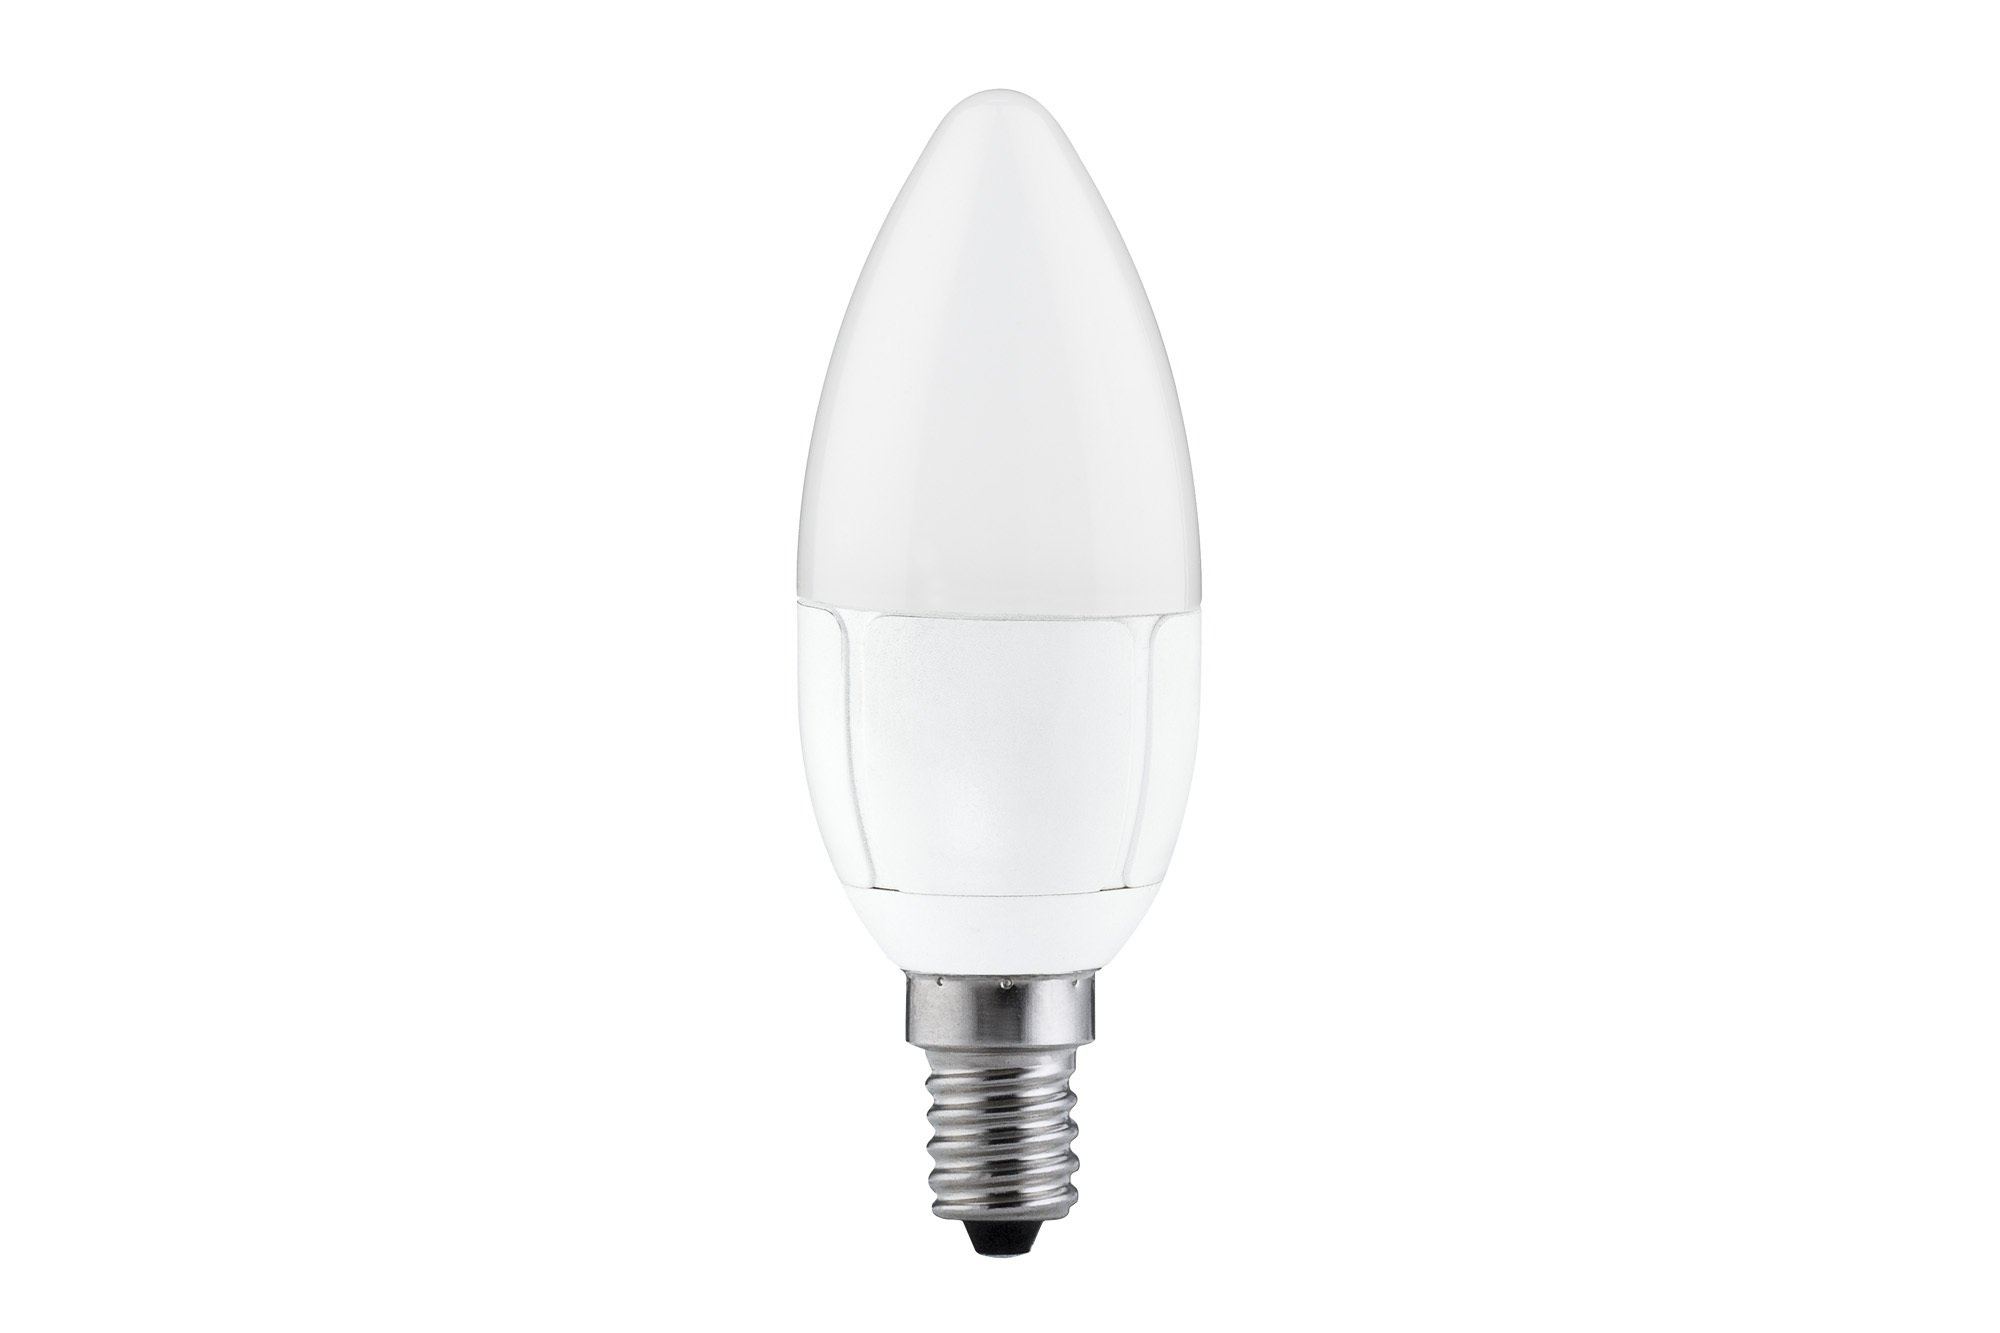 lampe flamme standard led e14 230v 5w blanc chaud 3000k paulmann gradable. Black Bedroom Furniture Sets. Home Design Ideas